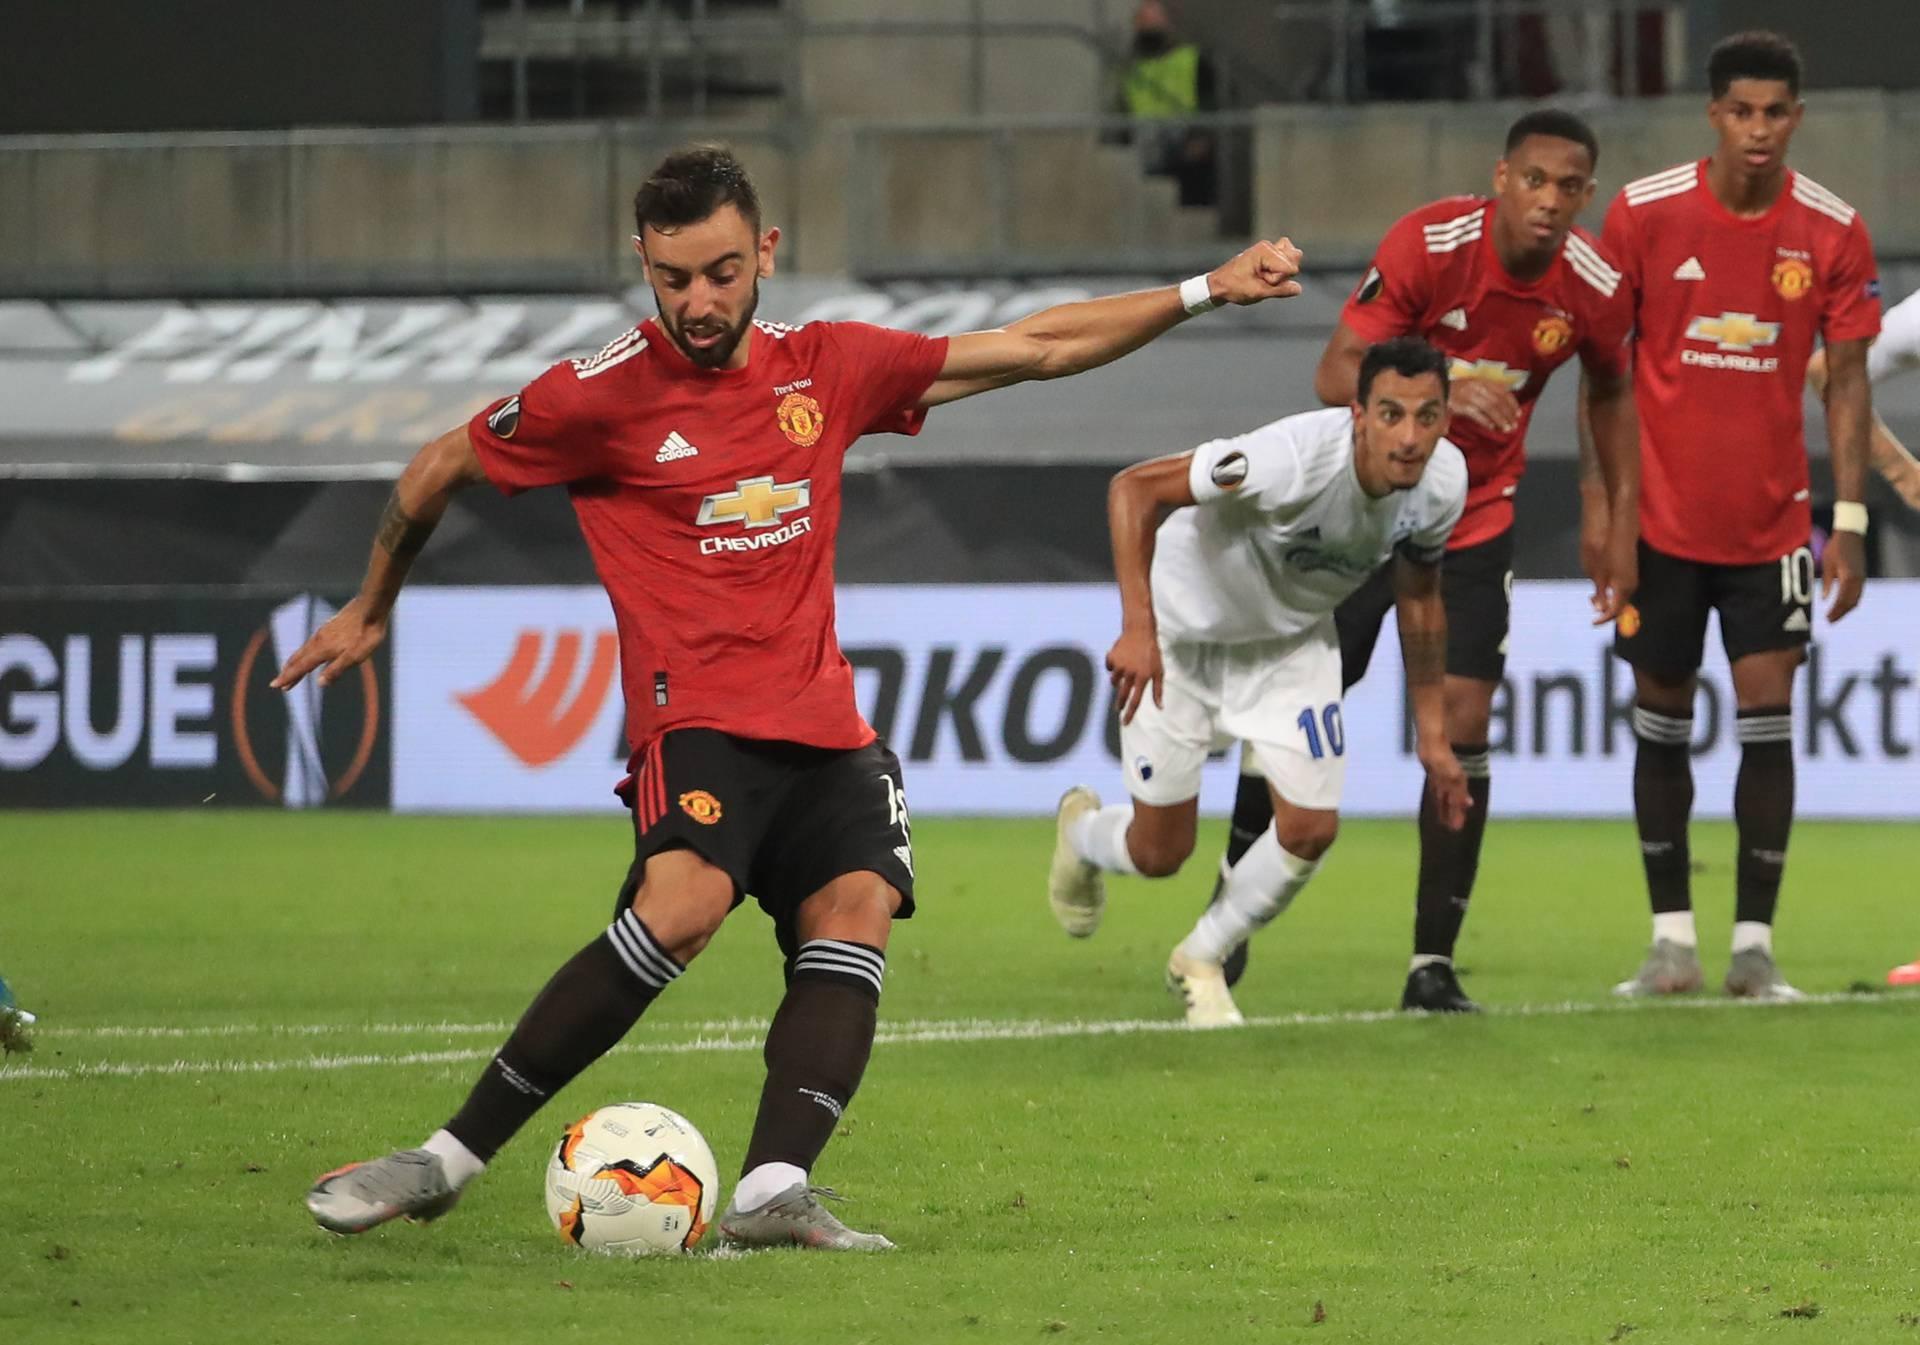 Europa League Quarter Final - Manchester United v FC Copenhagen